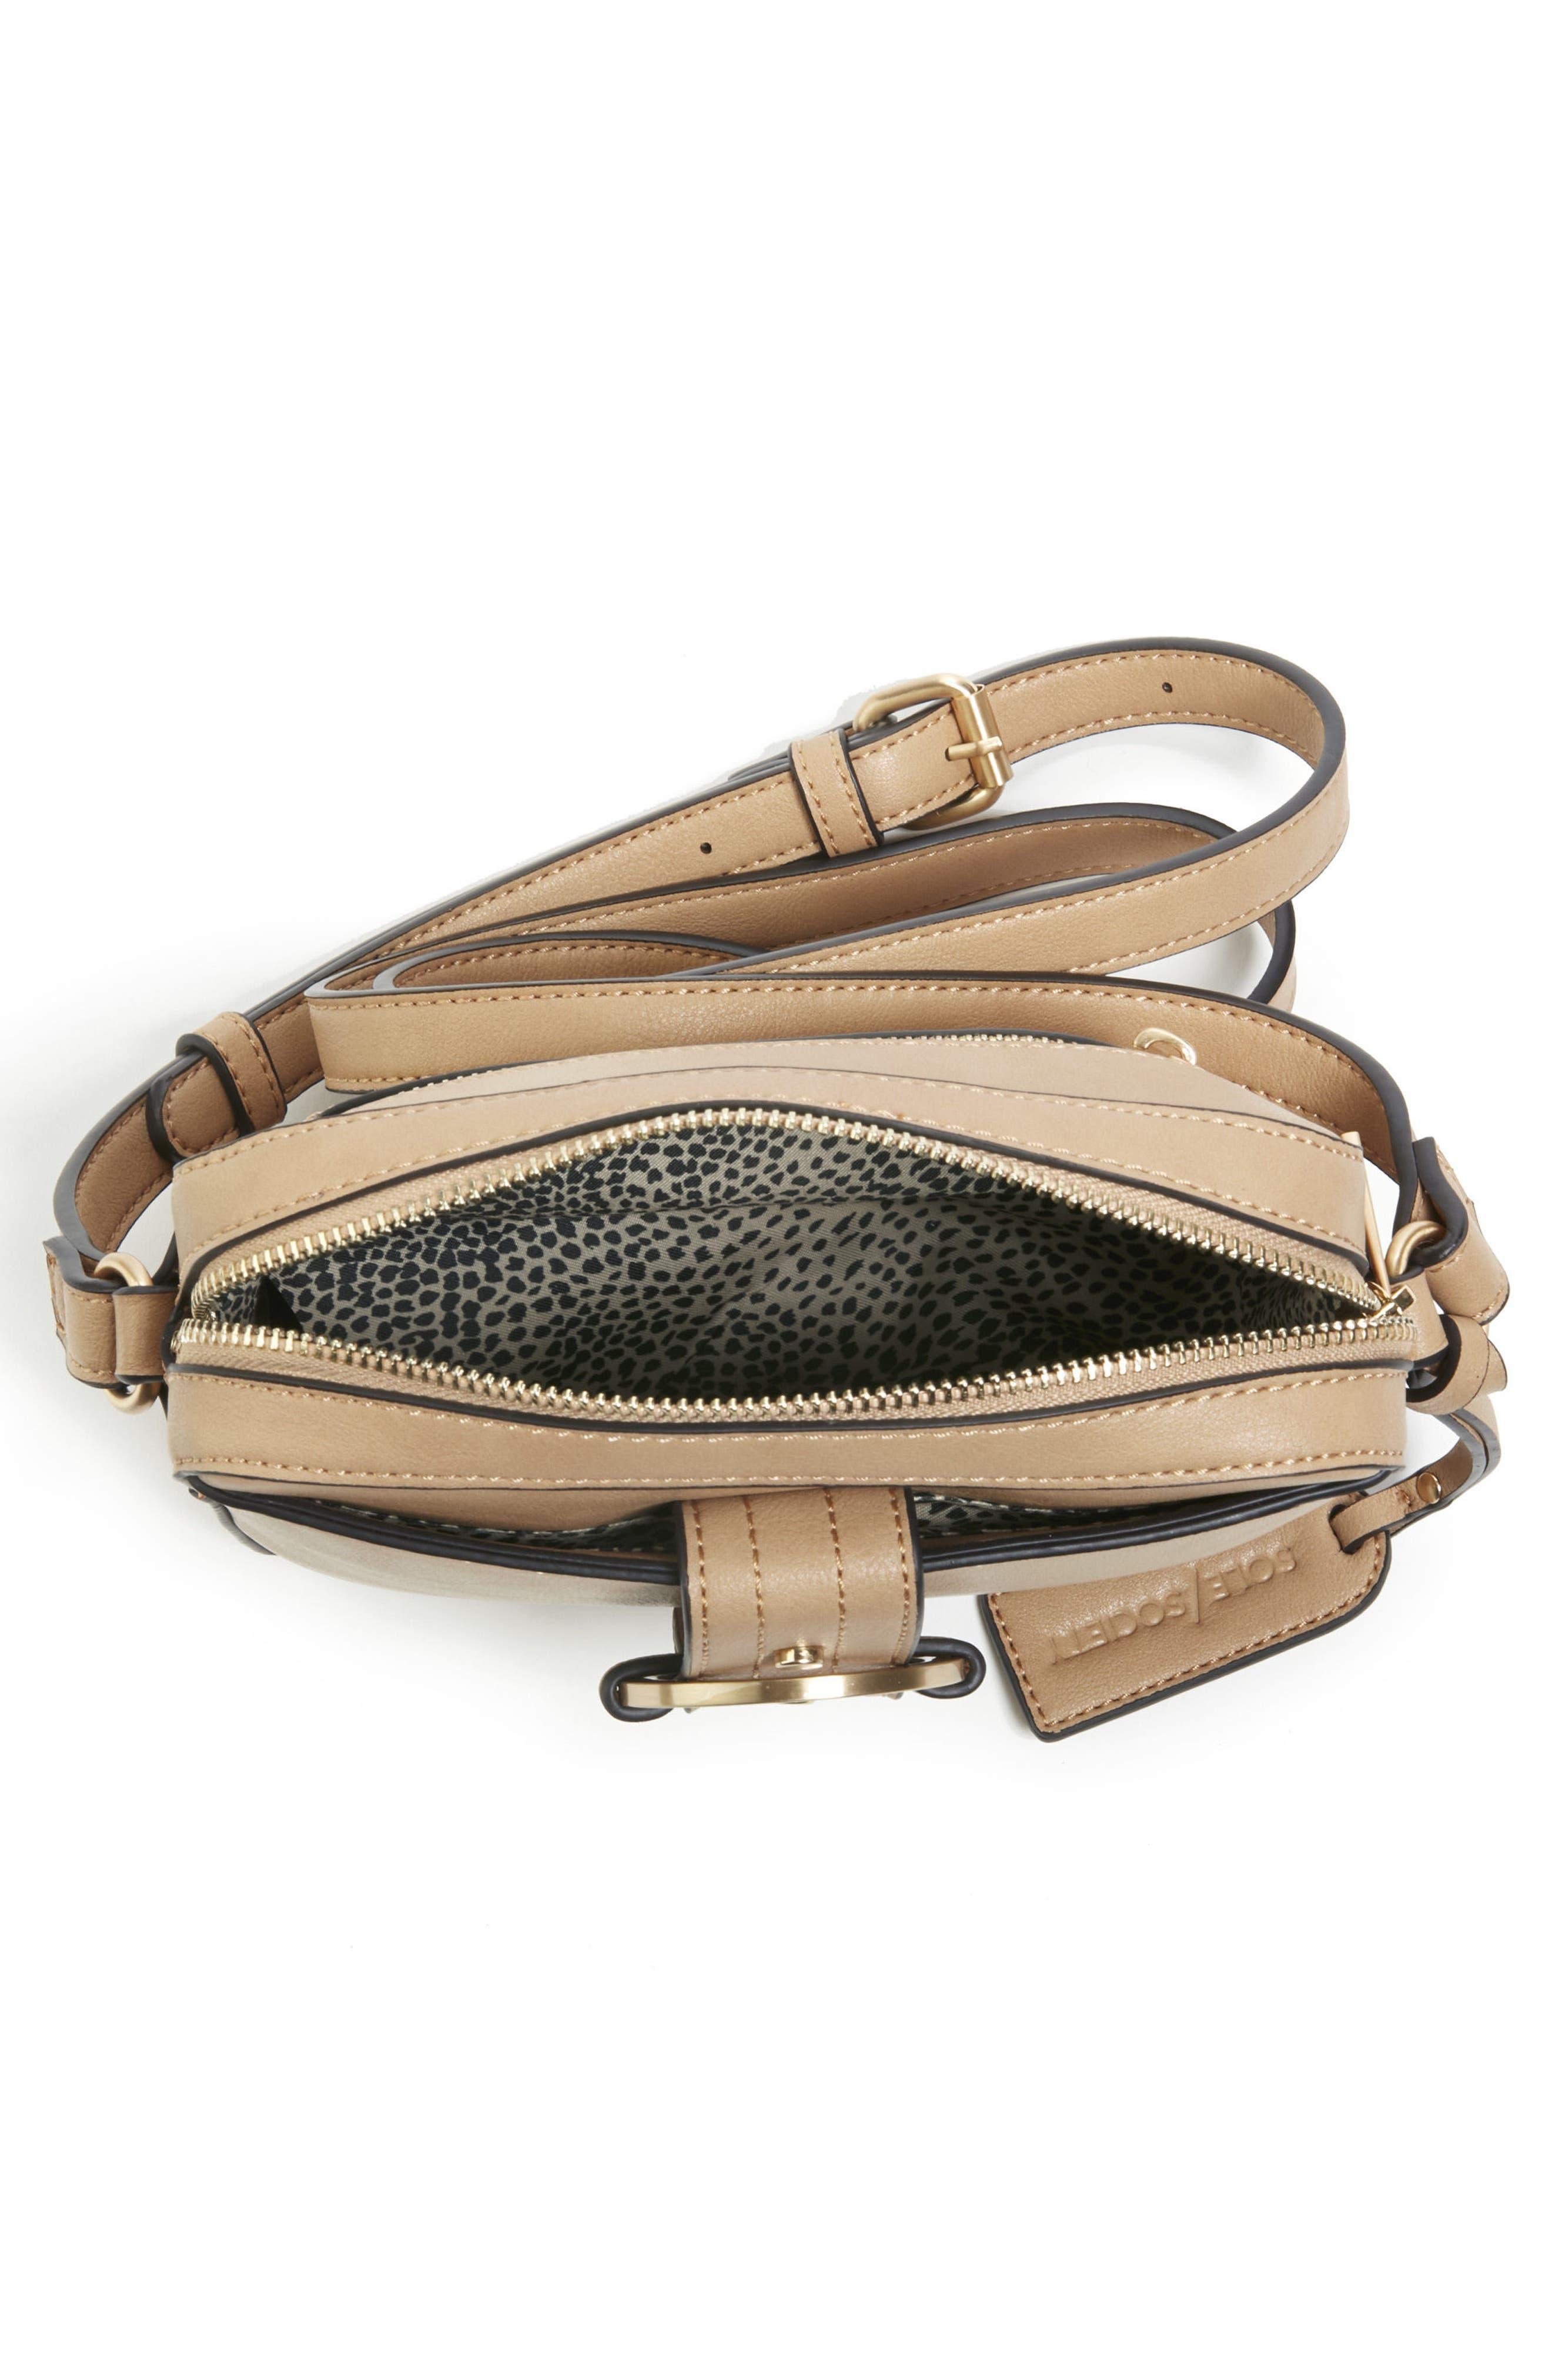 Faux Leather Camera Crossbody Bag,                             Alternate thumbnail 3, color,                             251